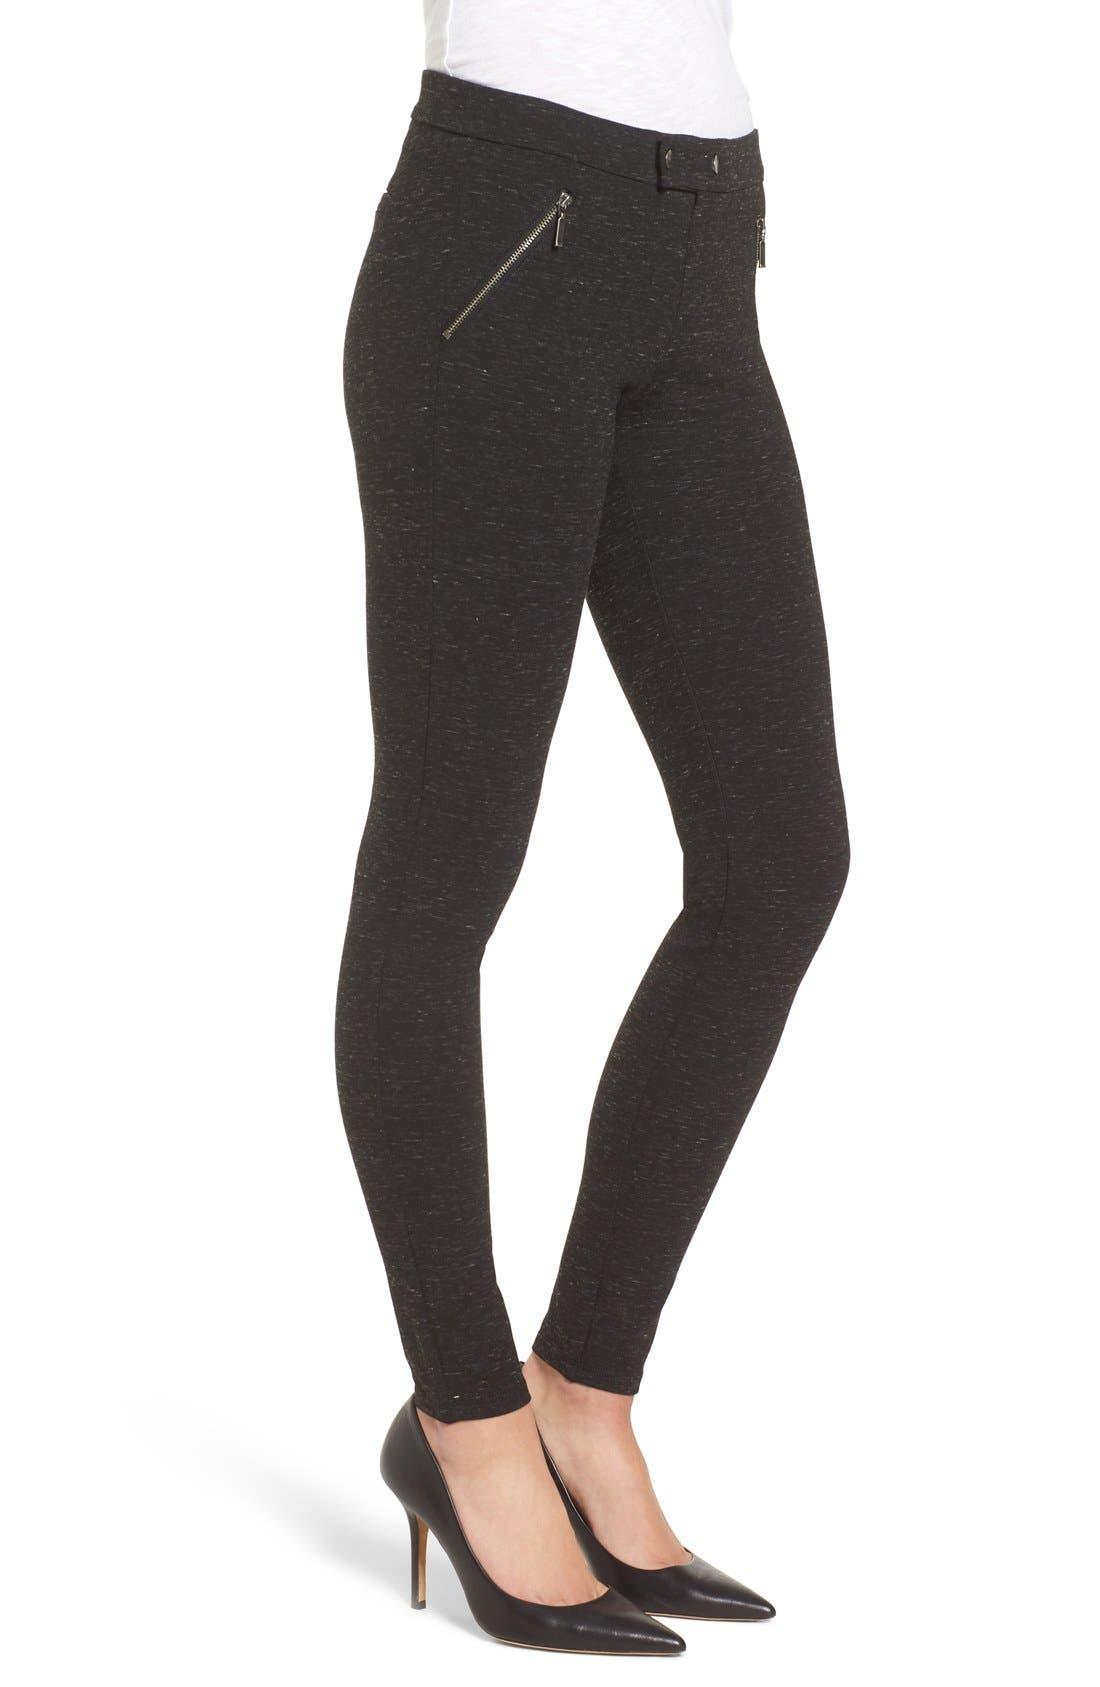 Alternate Image 3  - Wit & Wisdom Ponte Knit Pants (Regular & Petite) (Nordstrom Exclusive)